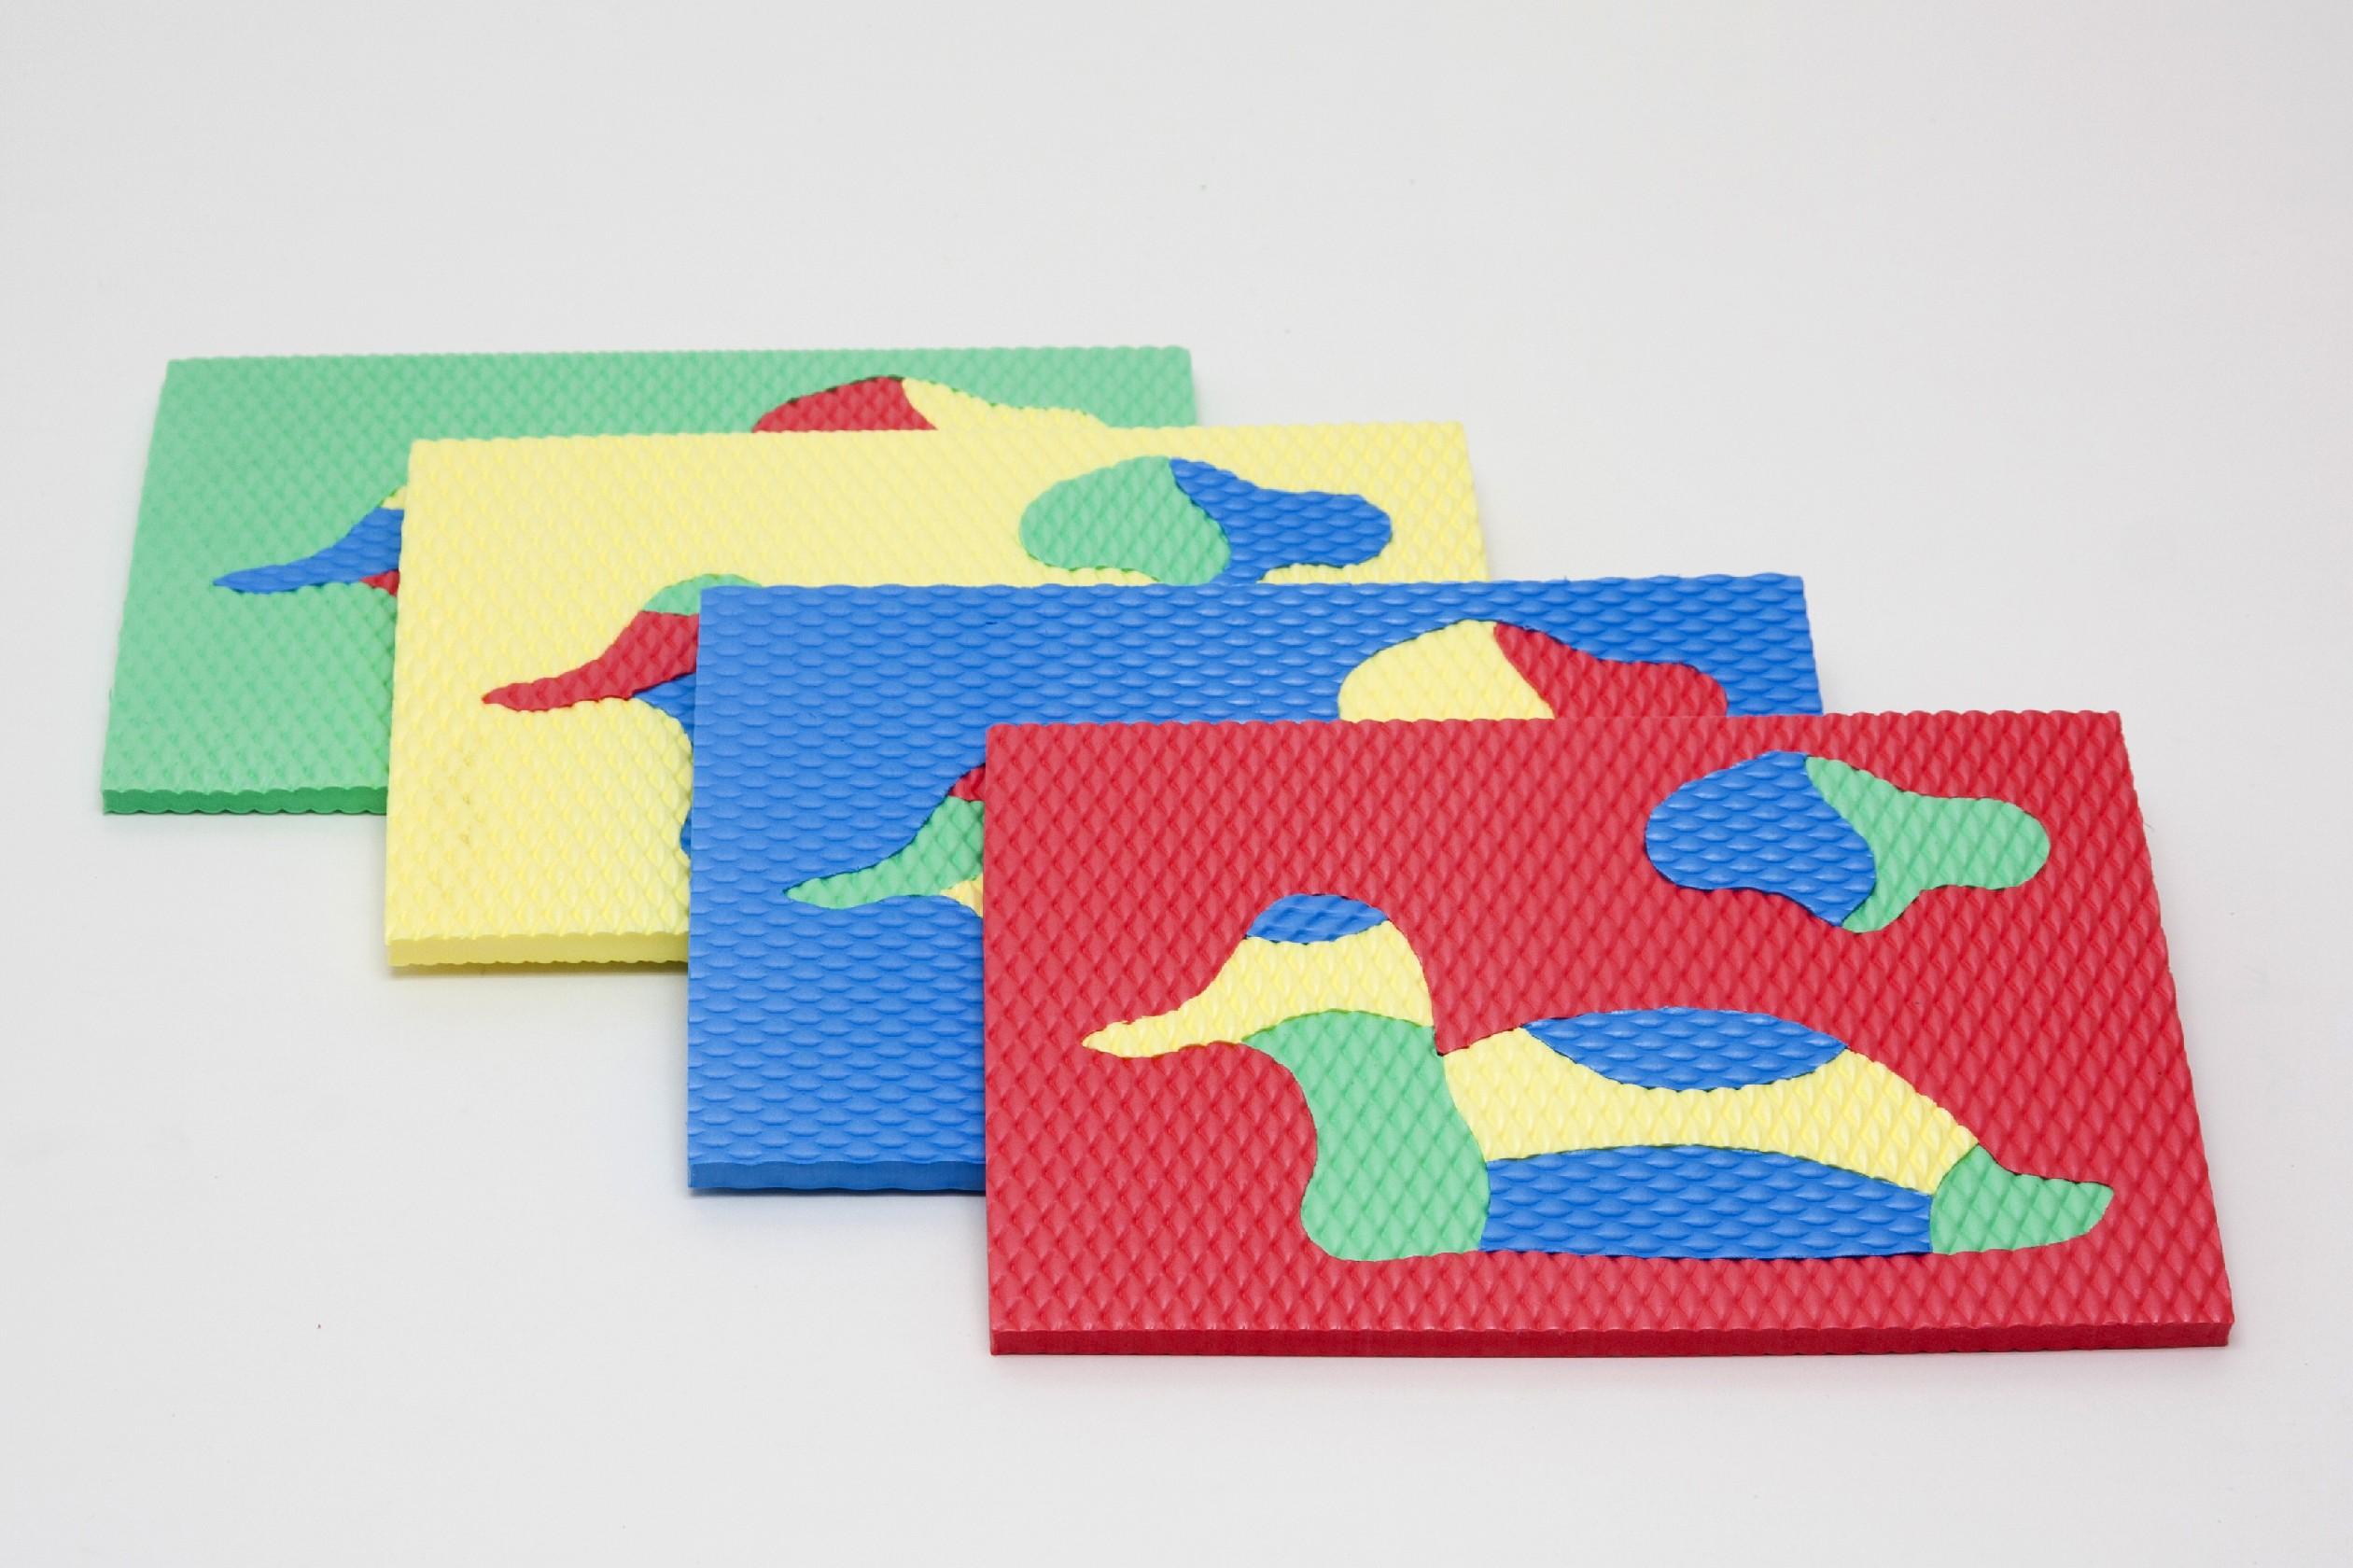 Vkládačka INSPIRA - sada 4 kusů Tvar: Geometrické tvary